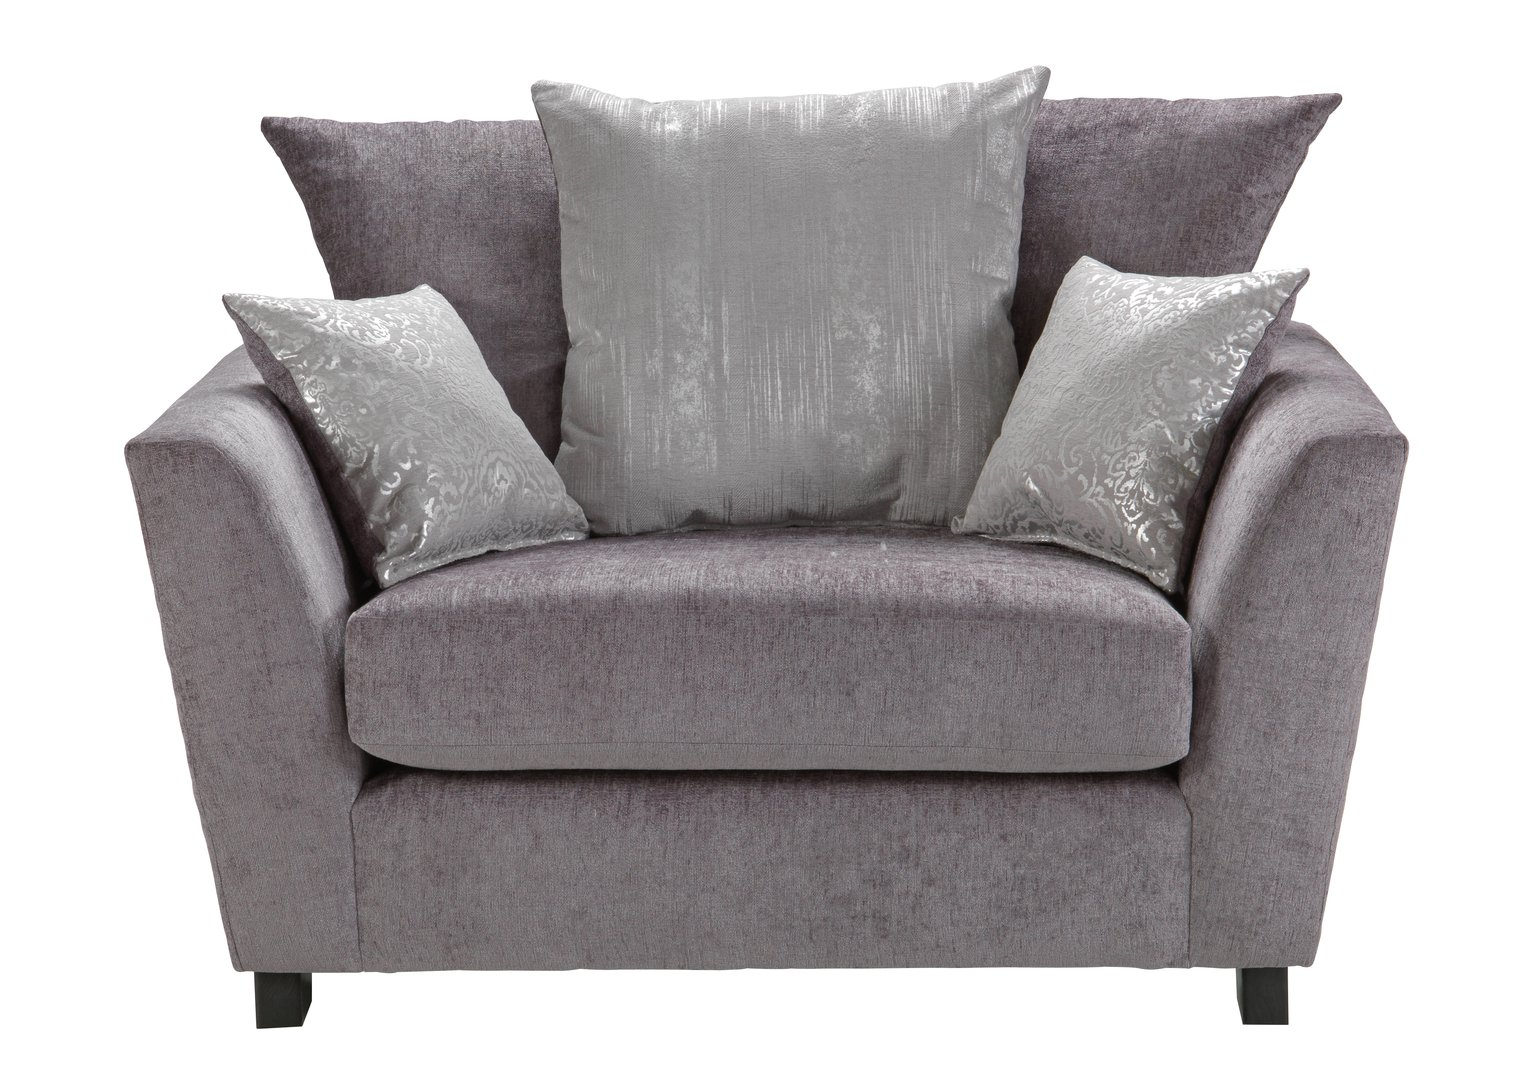 Argos Home Vivienne Fabric Cuddle Chair - Silver